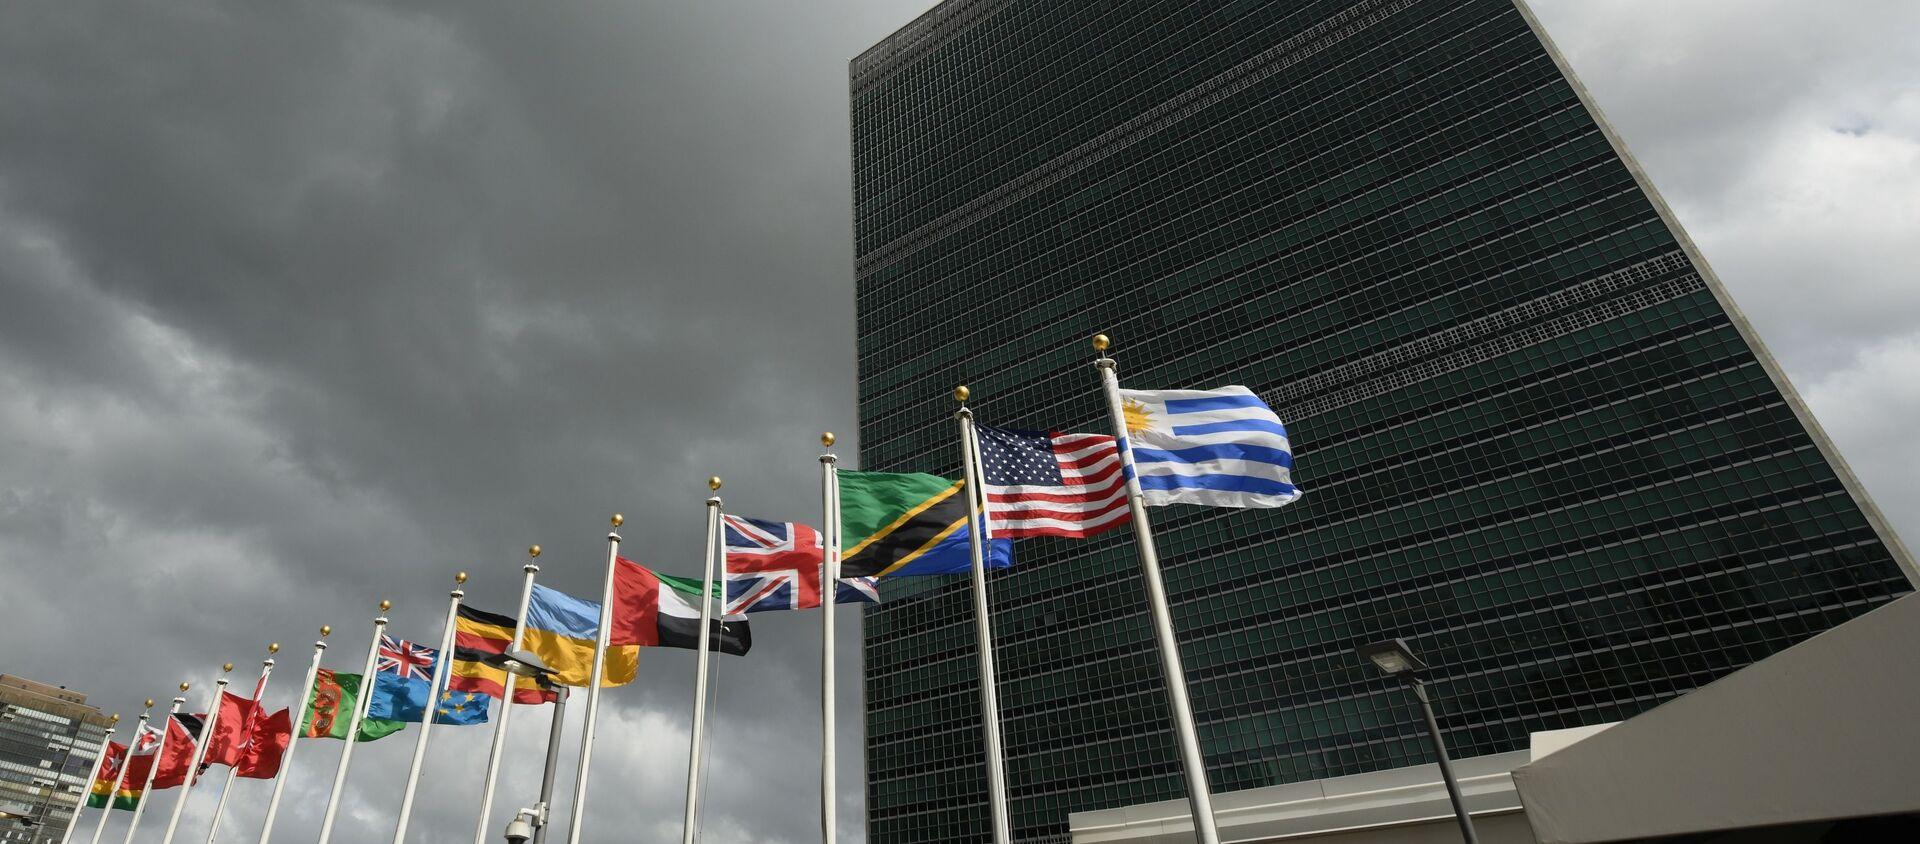 La sede dell'Onu a New York - Sputnik Italia, 1920, 29.01.2021